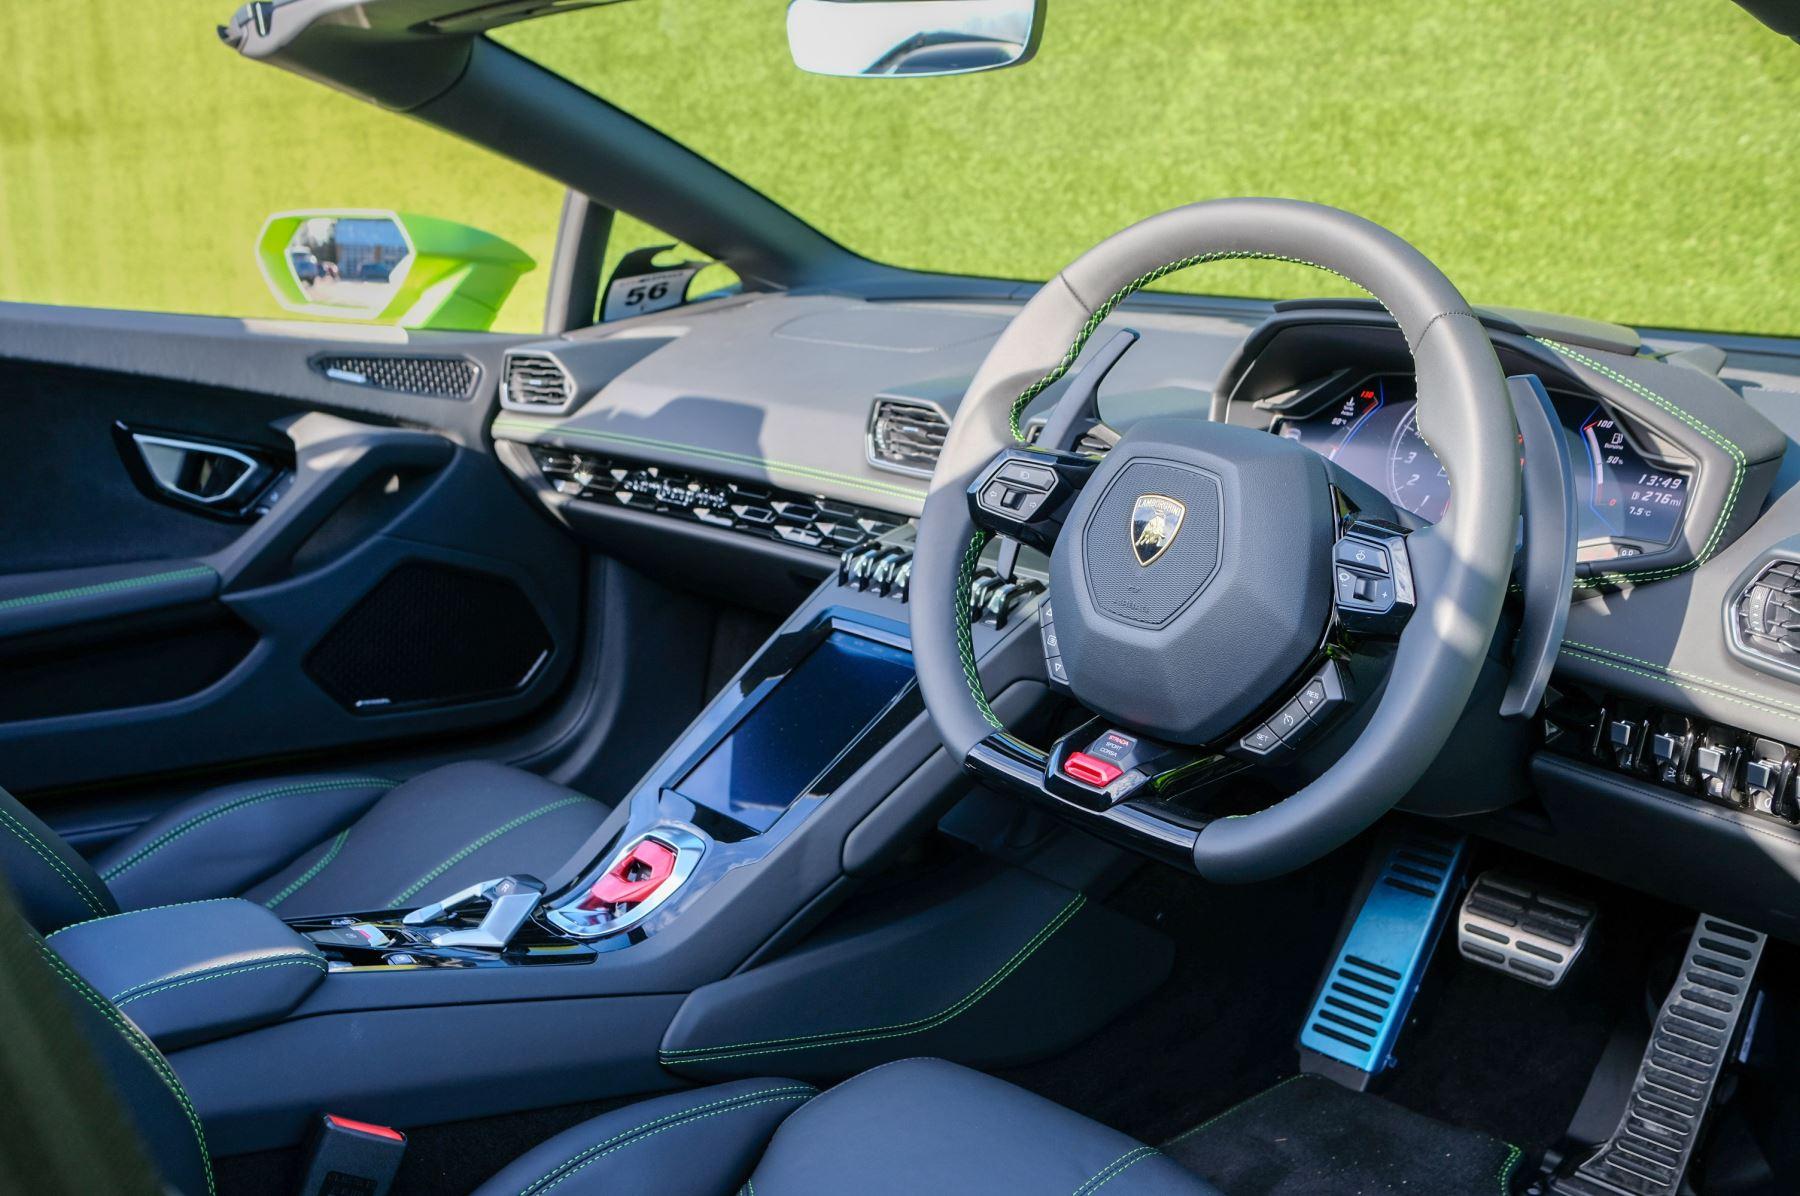 Lamborghini Huracan EVO Spyder 5.2 V10 610 2dr Auto image 12